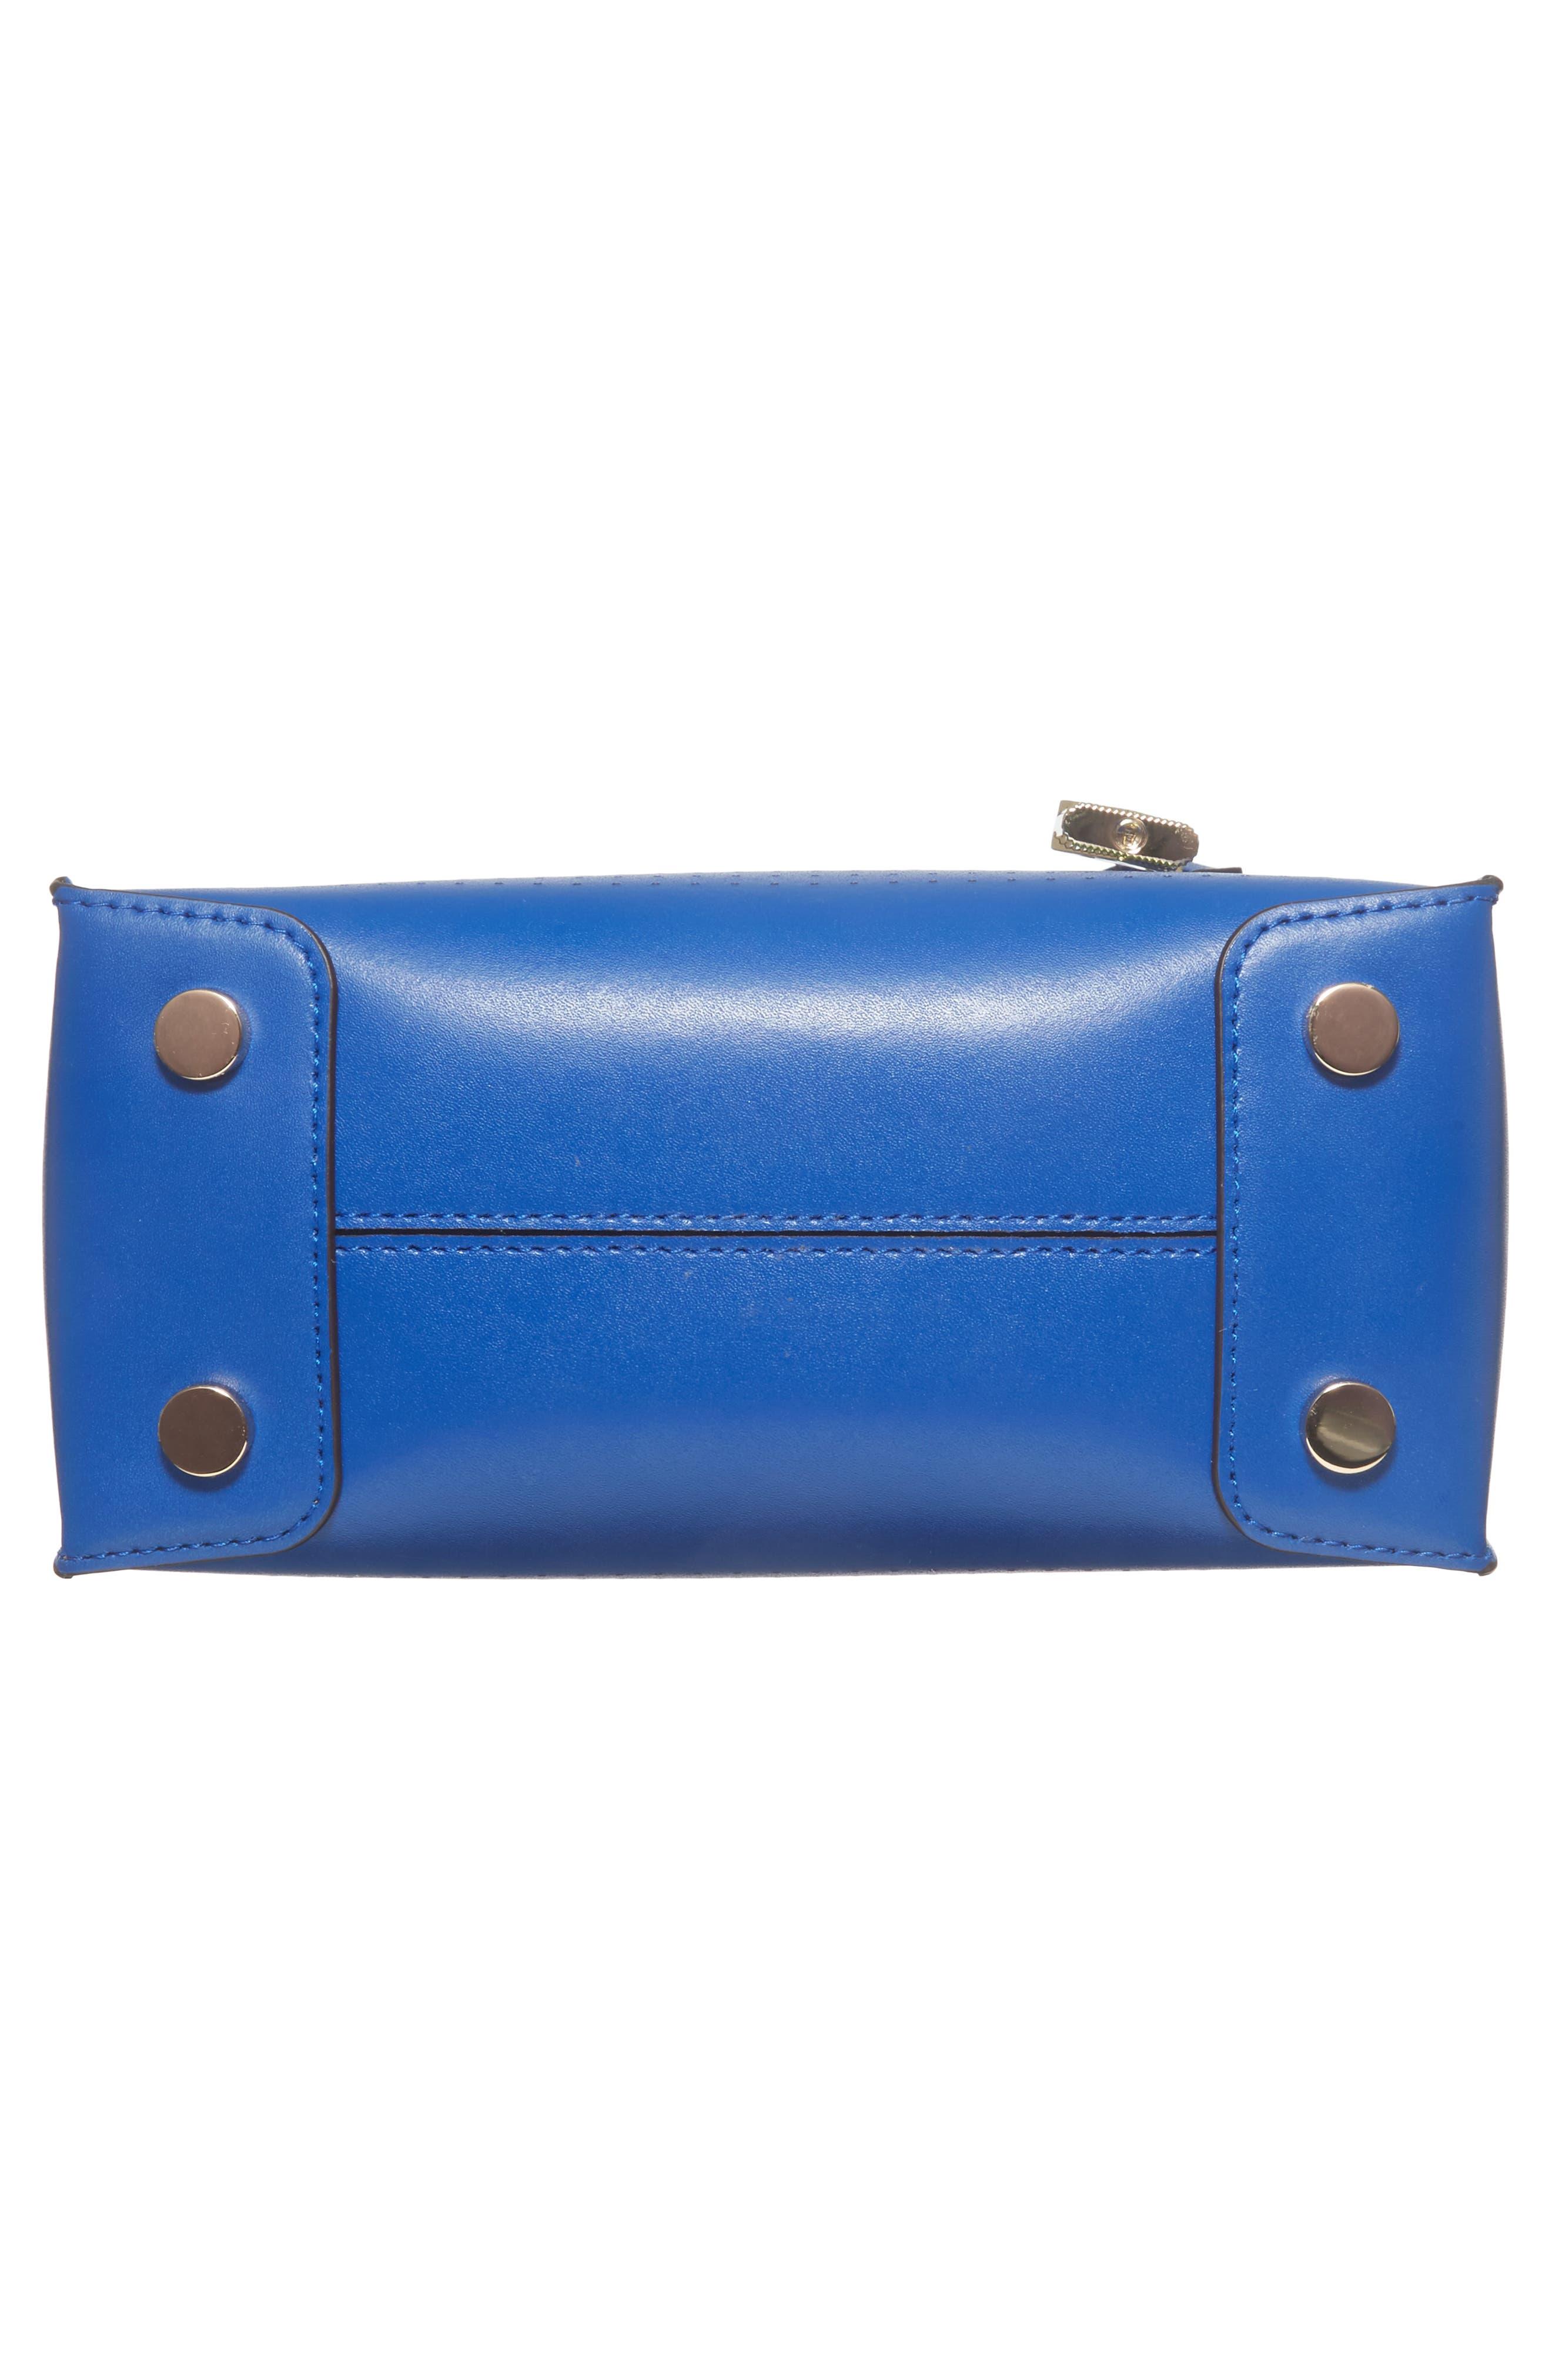 MICHAEL Michael Kors Medium Mercer Leather Crossbody Bag,                             Alternate thumbnail 6, color,